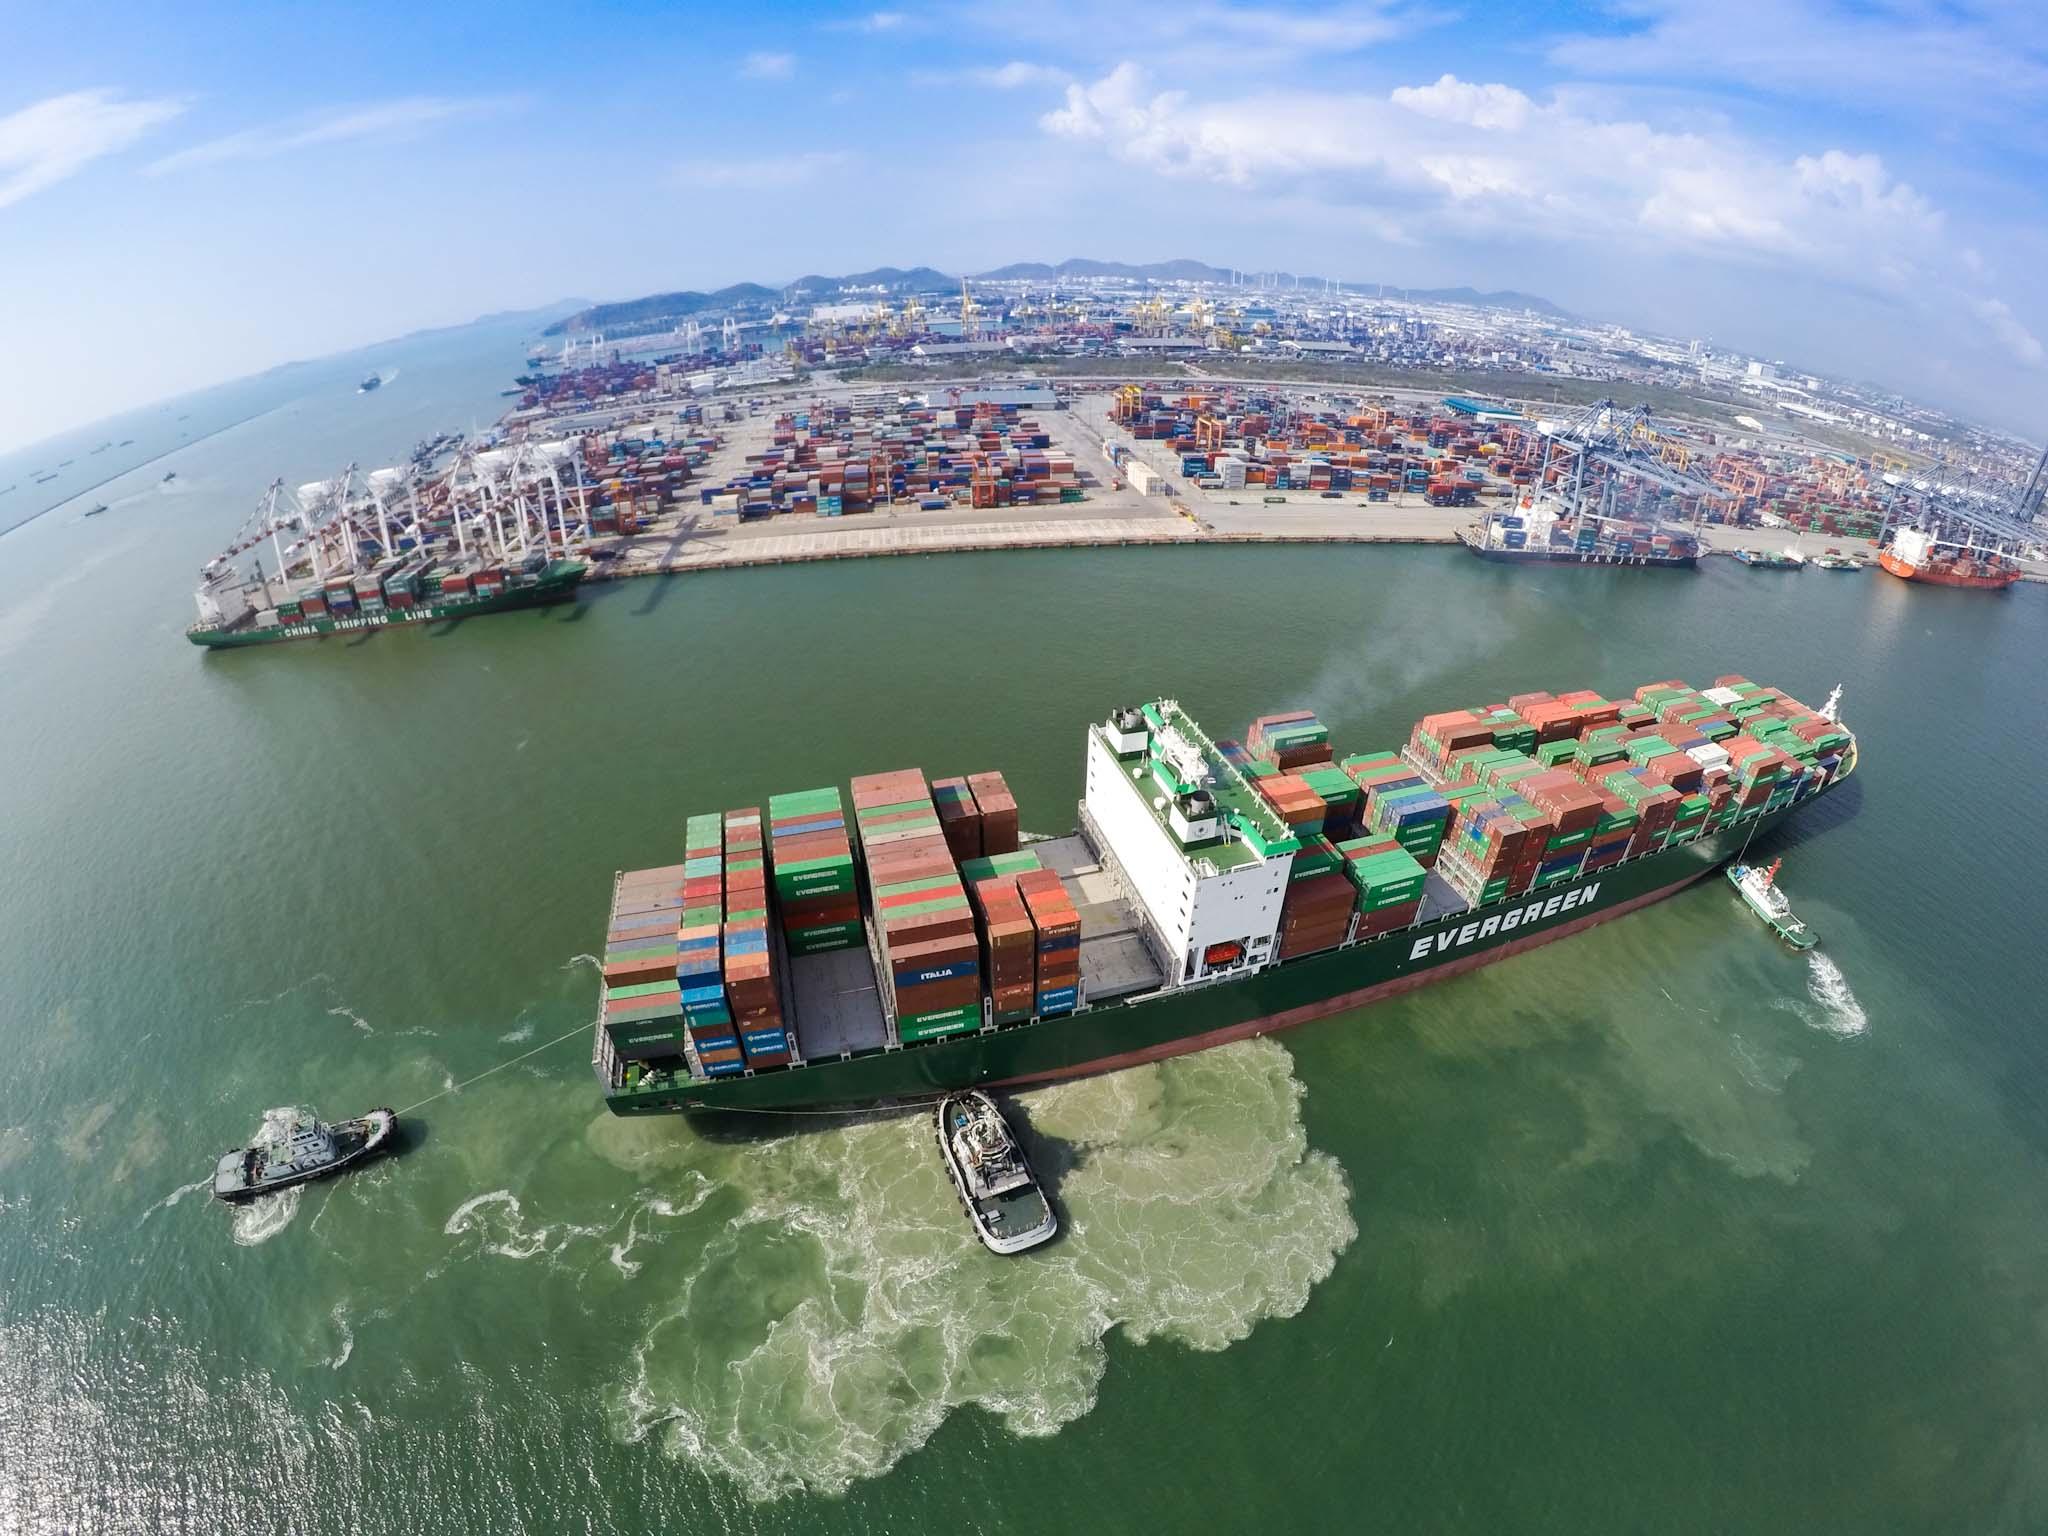 Shipment-DBA